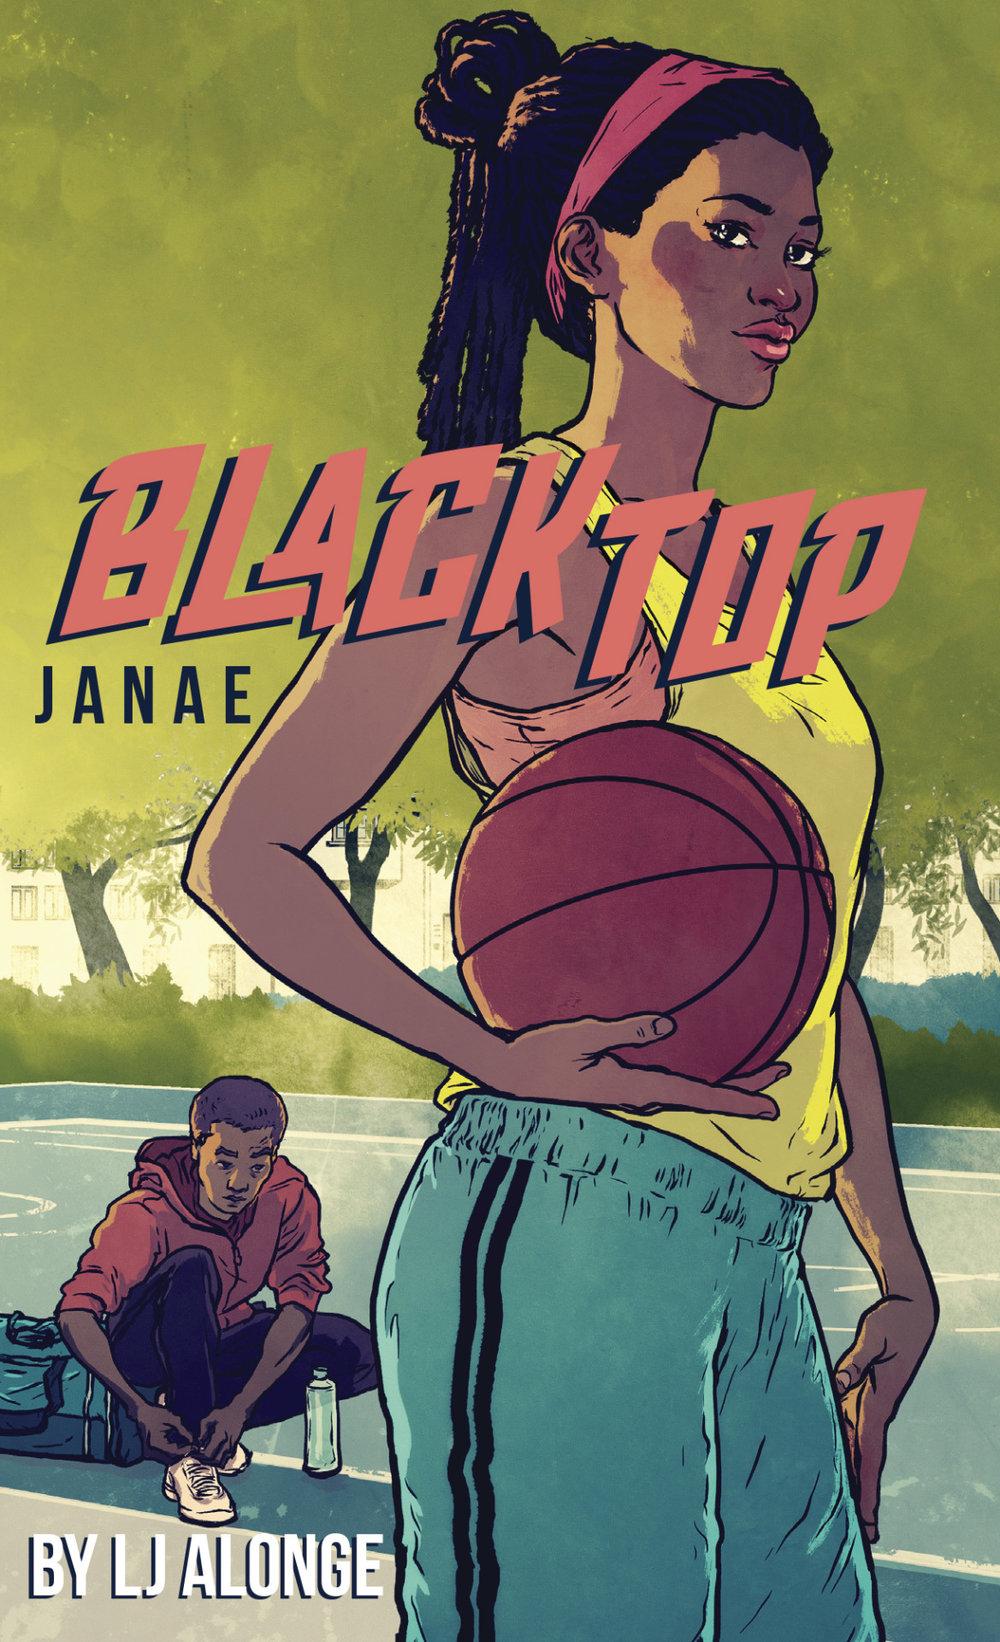 Blacktop: Janae